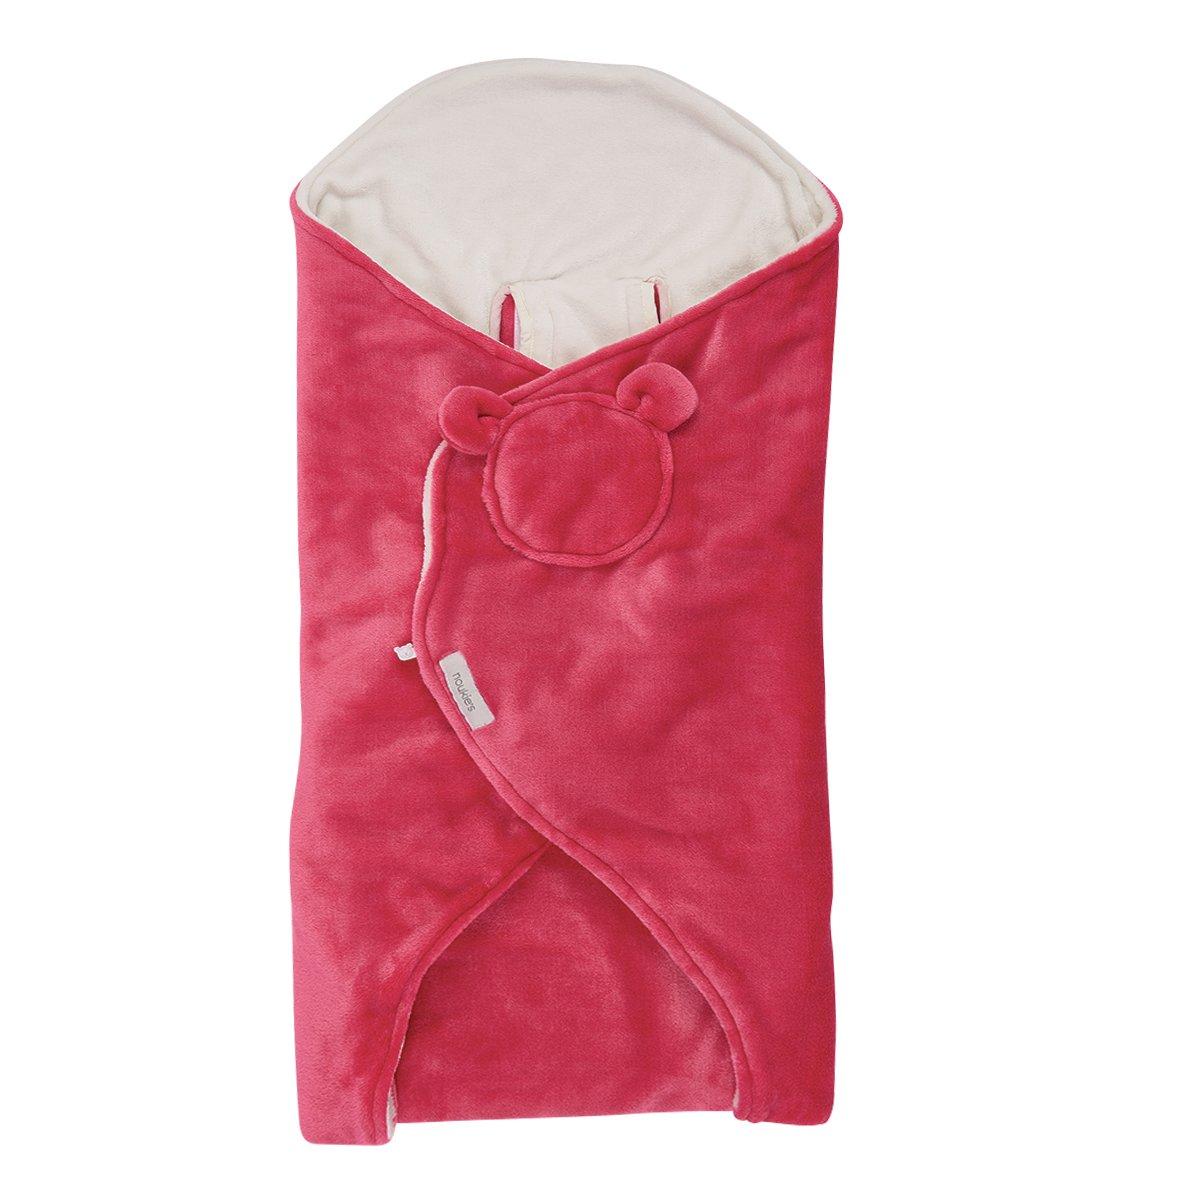 Noukies BB16012.16 Himbeere/Nougat Spaziergangsdecke, rosa